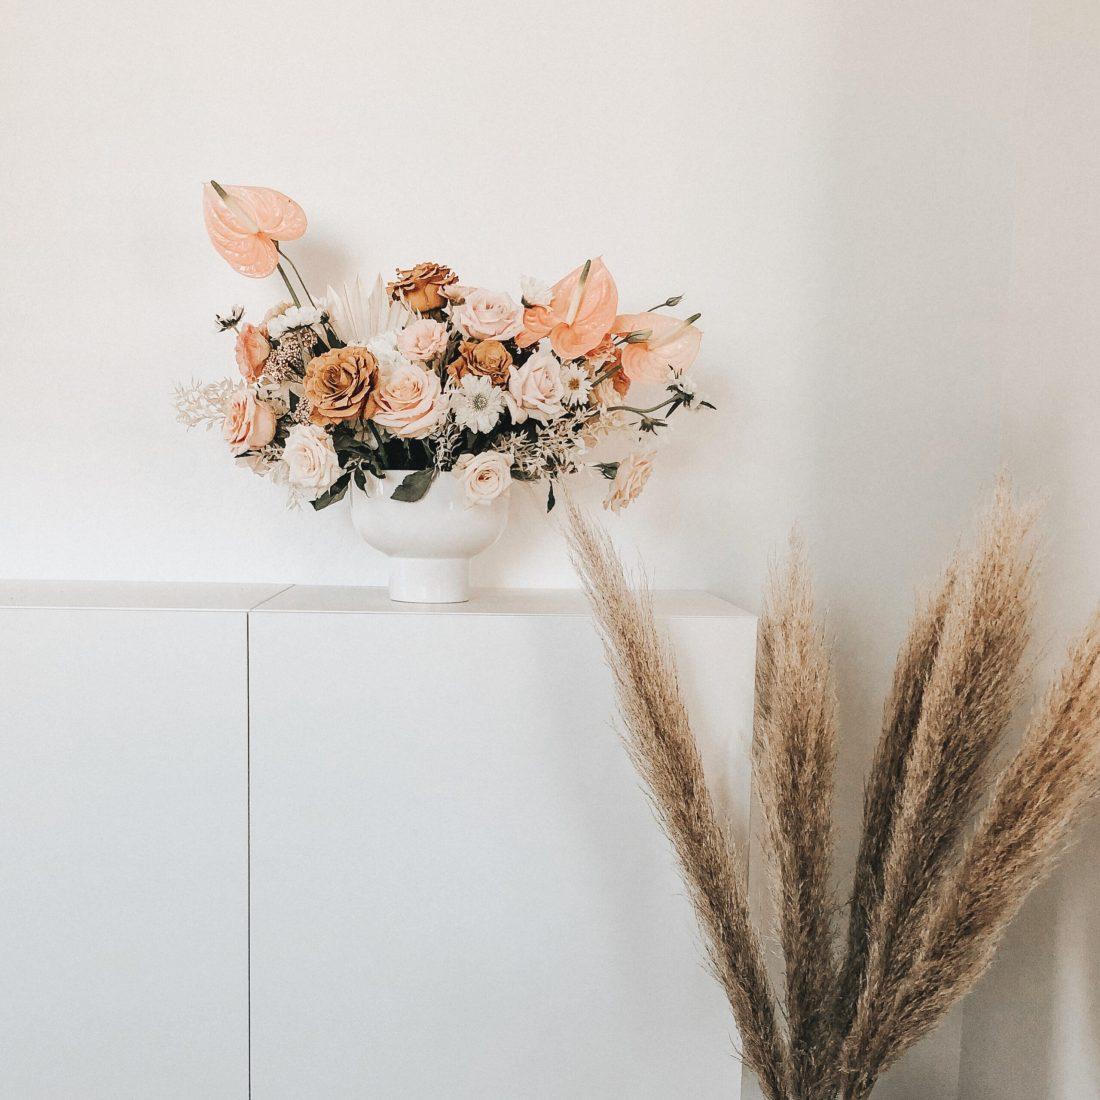 Dried Flower Arrangements Darling Darleen A Lifestyle Design Blog